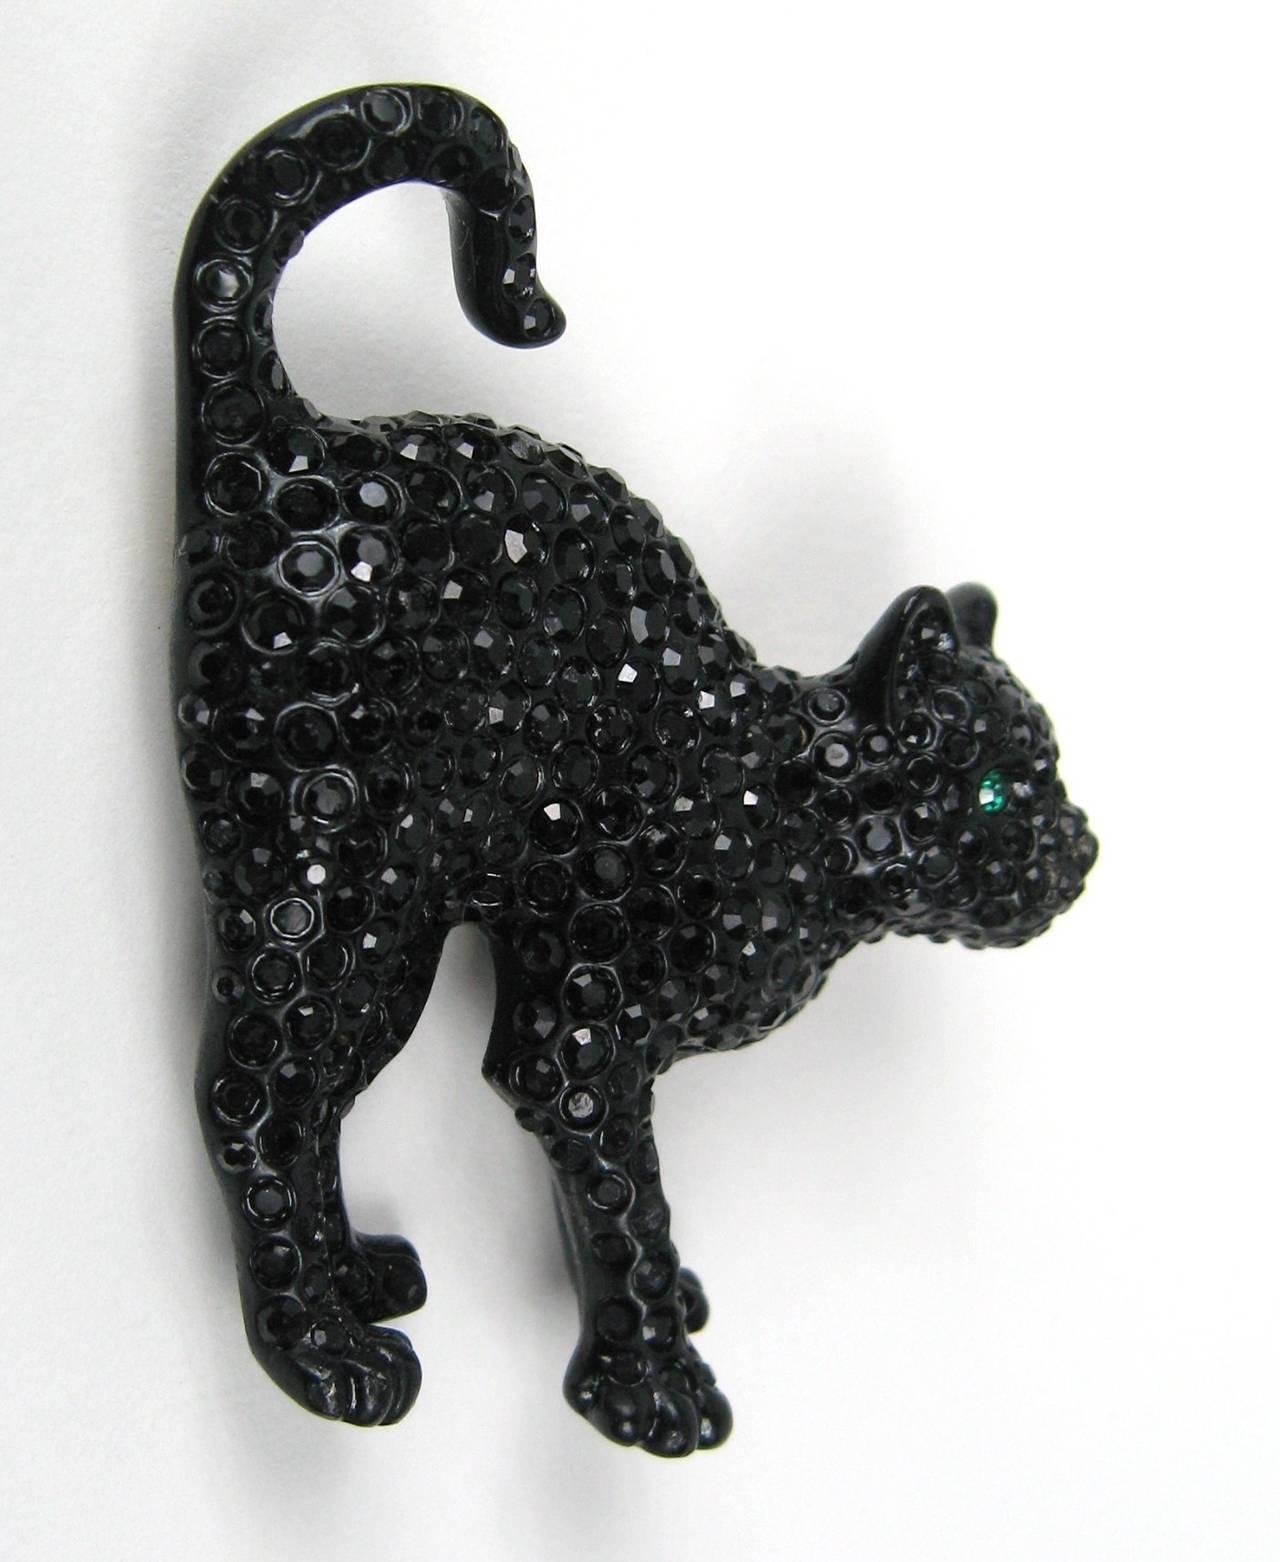 Swarovski Crystal Glitz Black Cat Brooch Pin New Never Worn  3